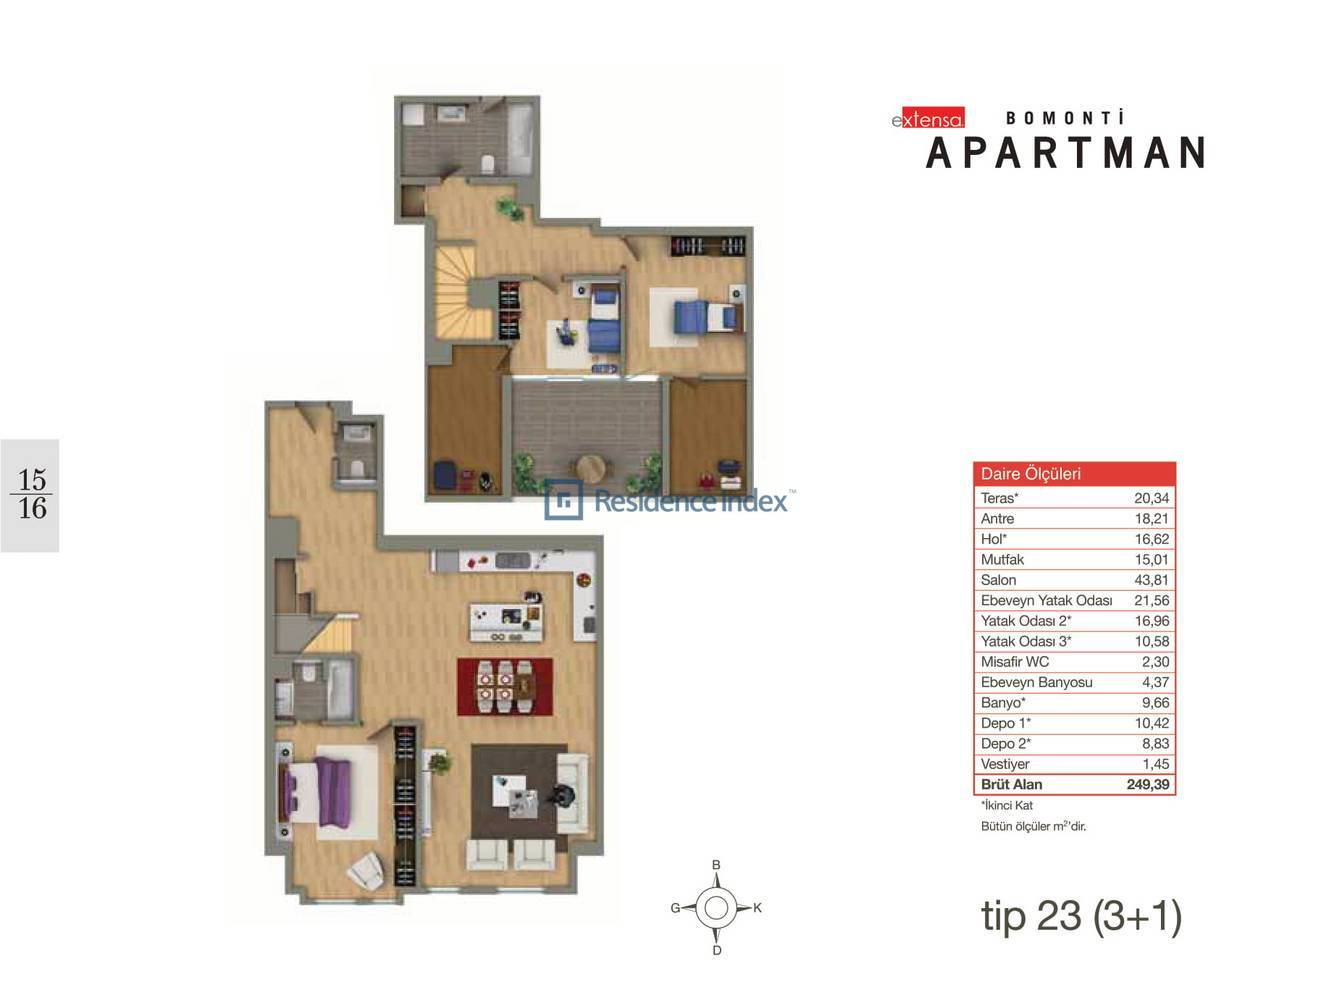 Bomonti Apartmanı Tip 23